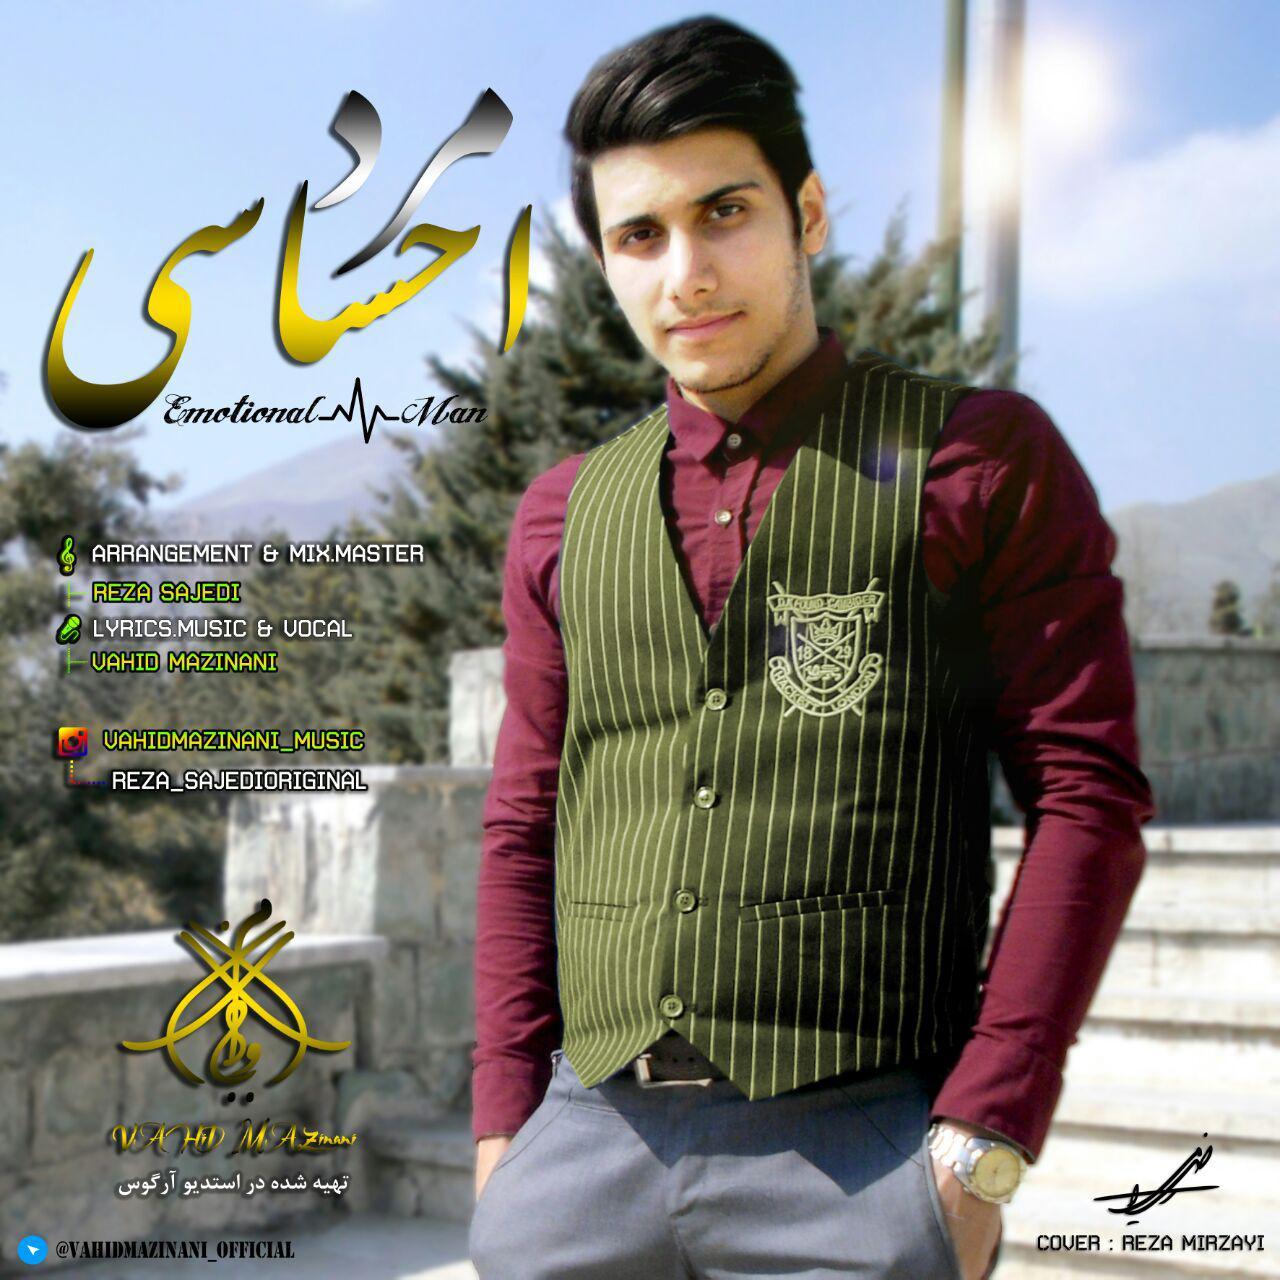 Vahid Mazinani – Marde Ehsasi